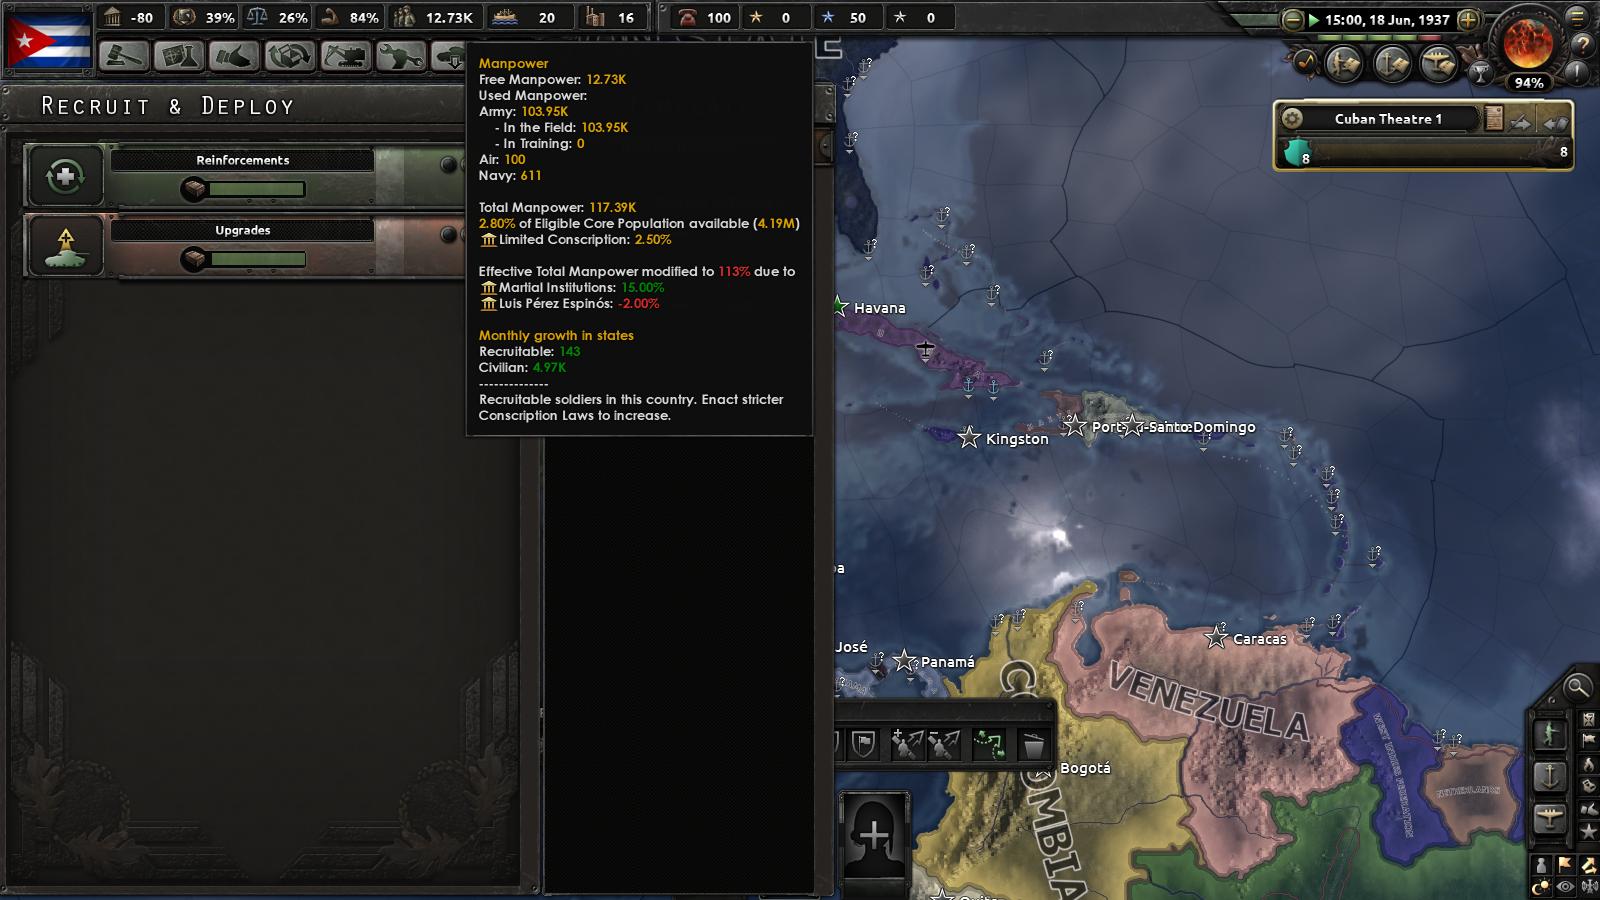 Cuba Manpower Glitch · Issue #3508 · KR4/Kaiserreich · GitHub